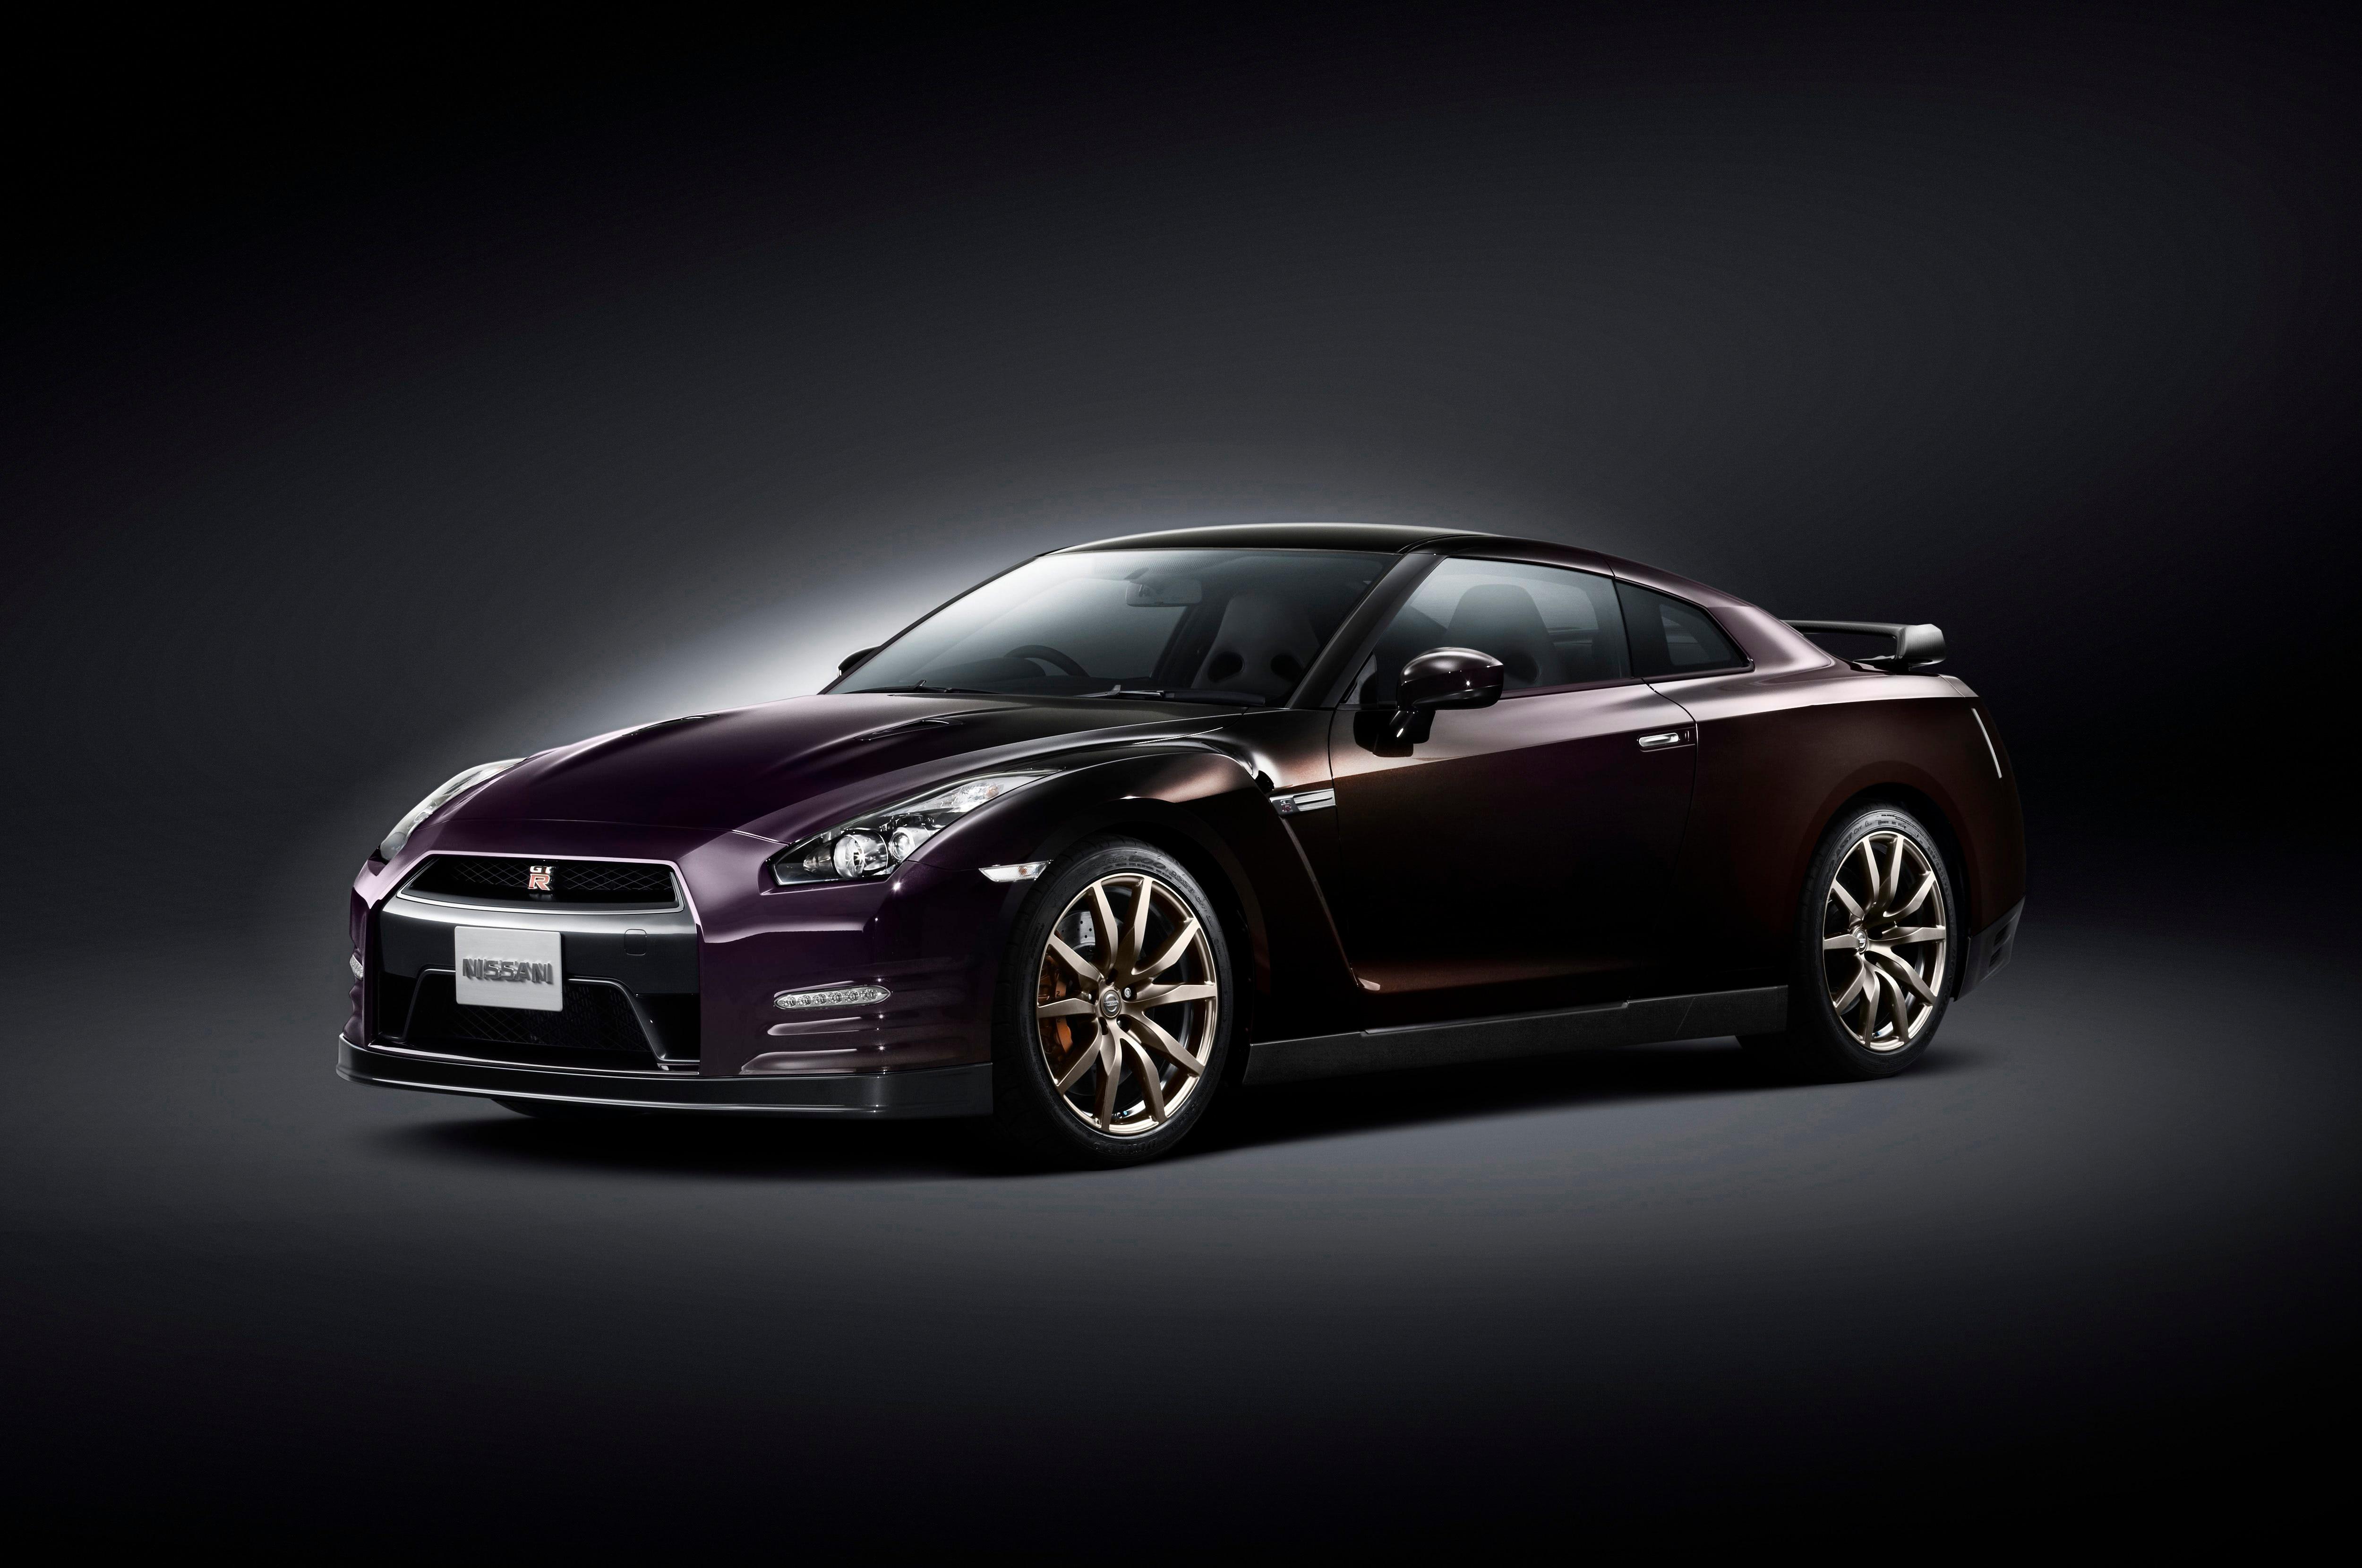 2014 Nissan Gtr Front Three Quarters1